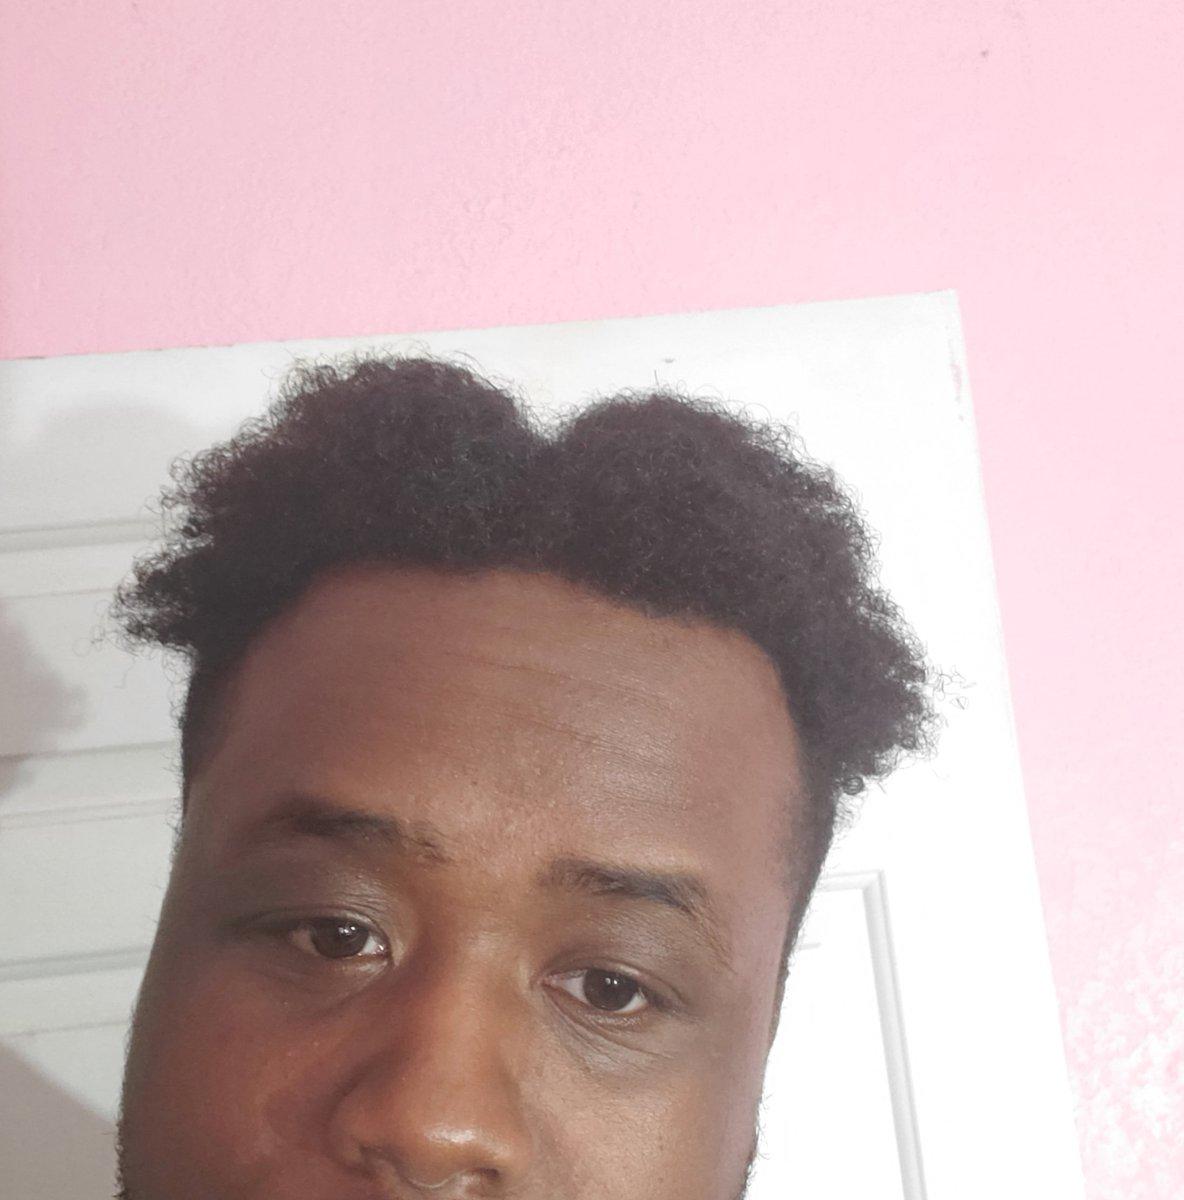 This nigga wanna be super saiyan trunks so bad, gwaf @dragonballz @dragonballsuperpic.twitter.com/eSkBS4NV40